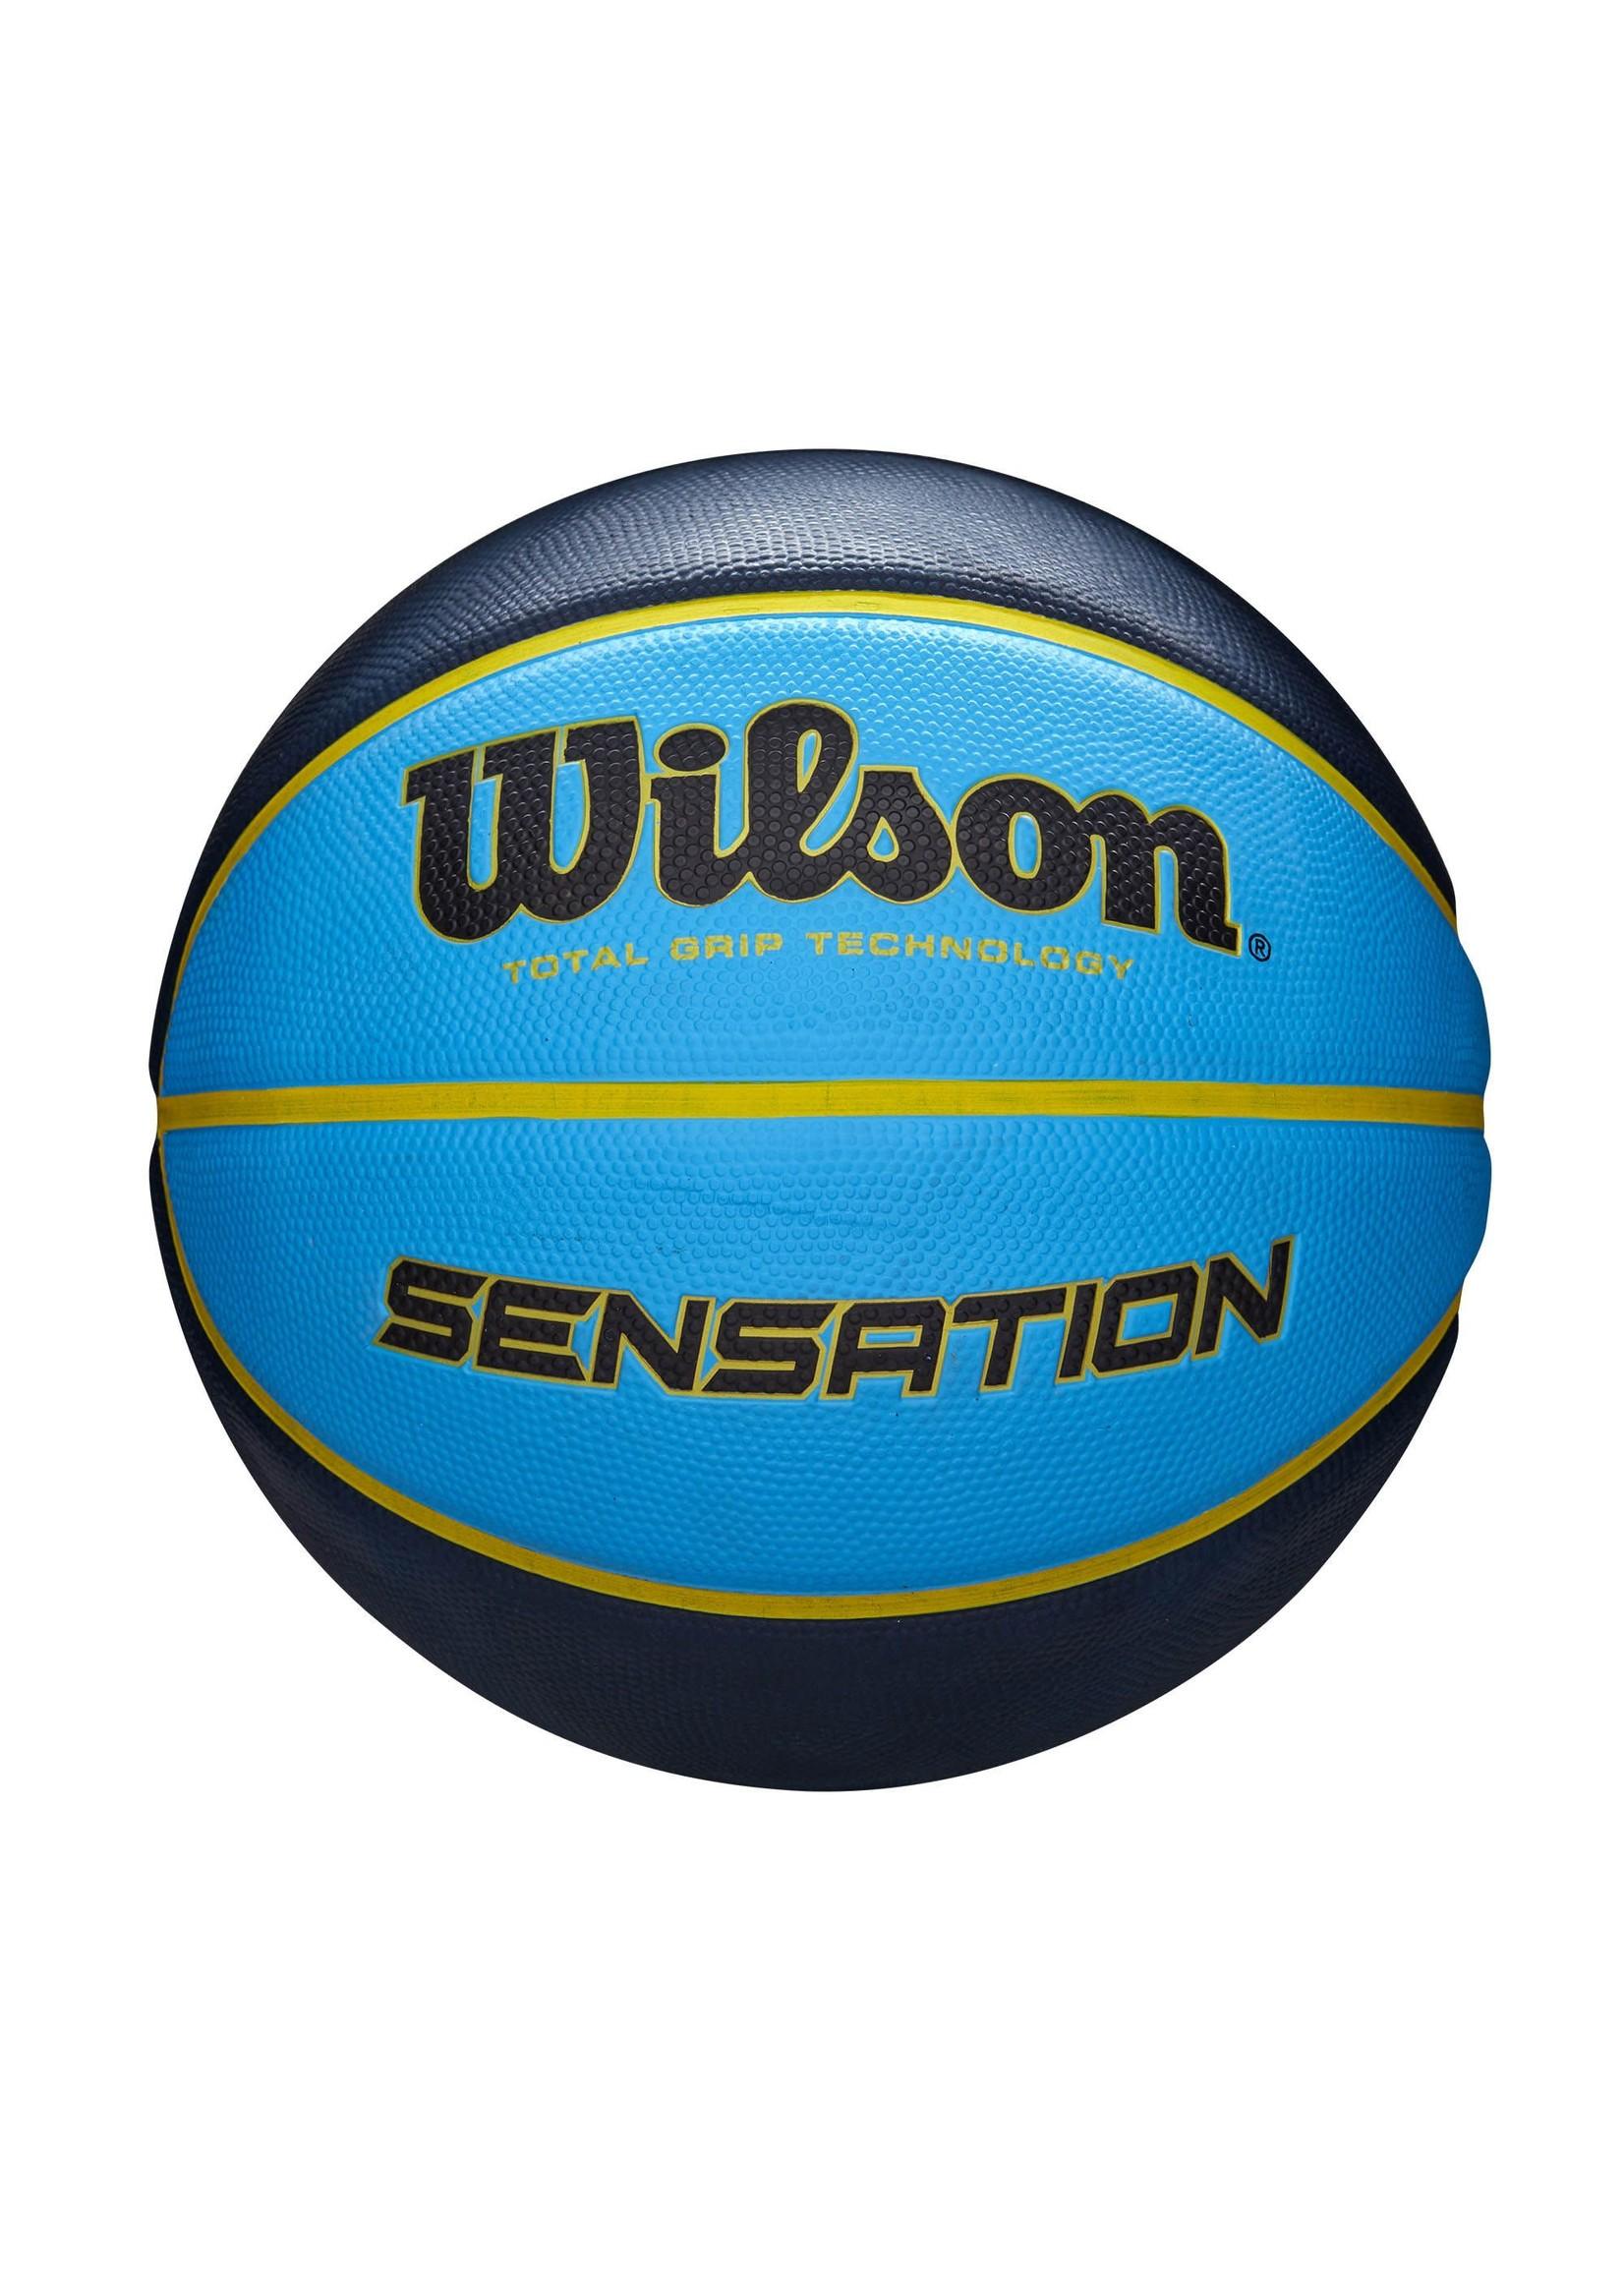 Wilson Sensation Basketball, Size 7